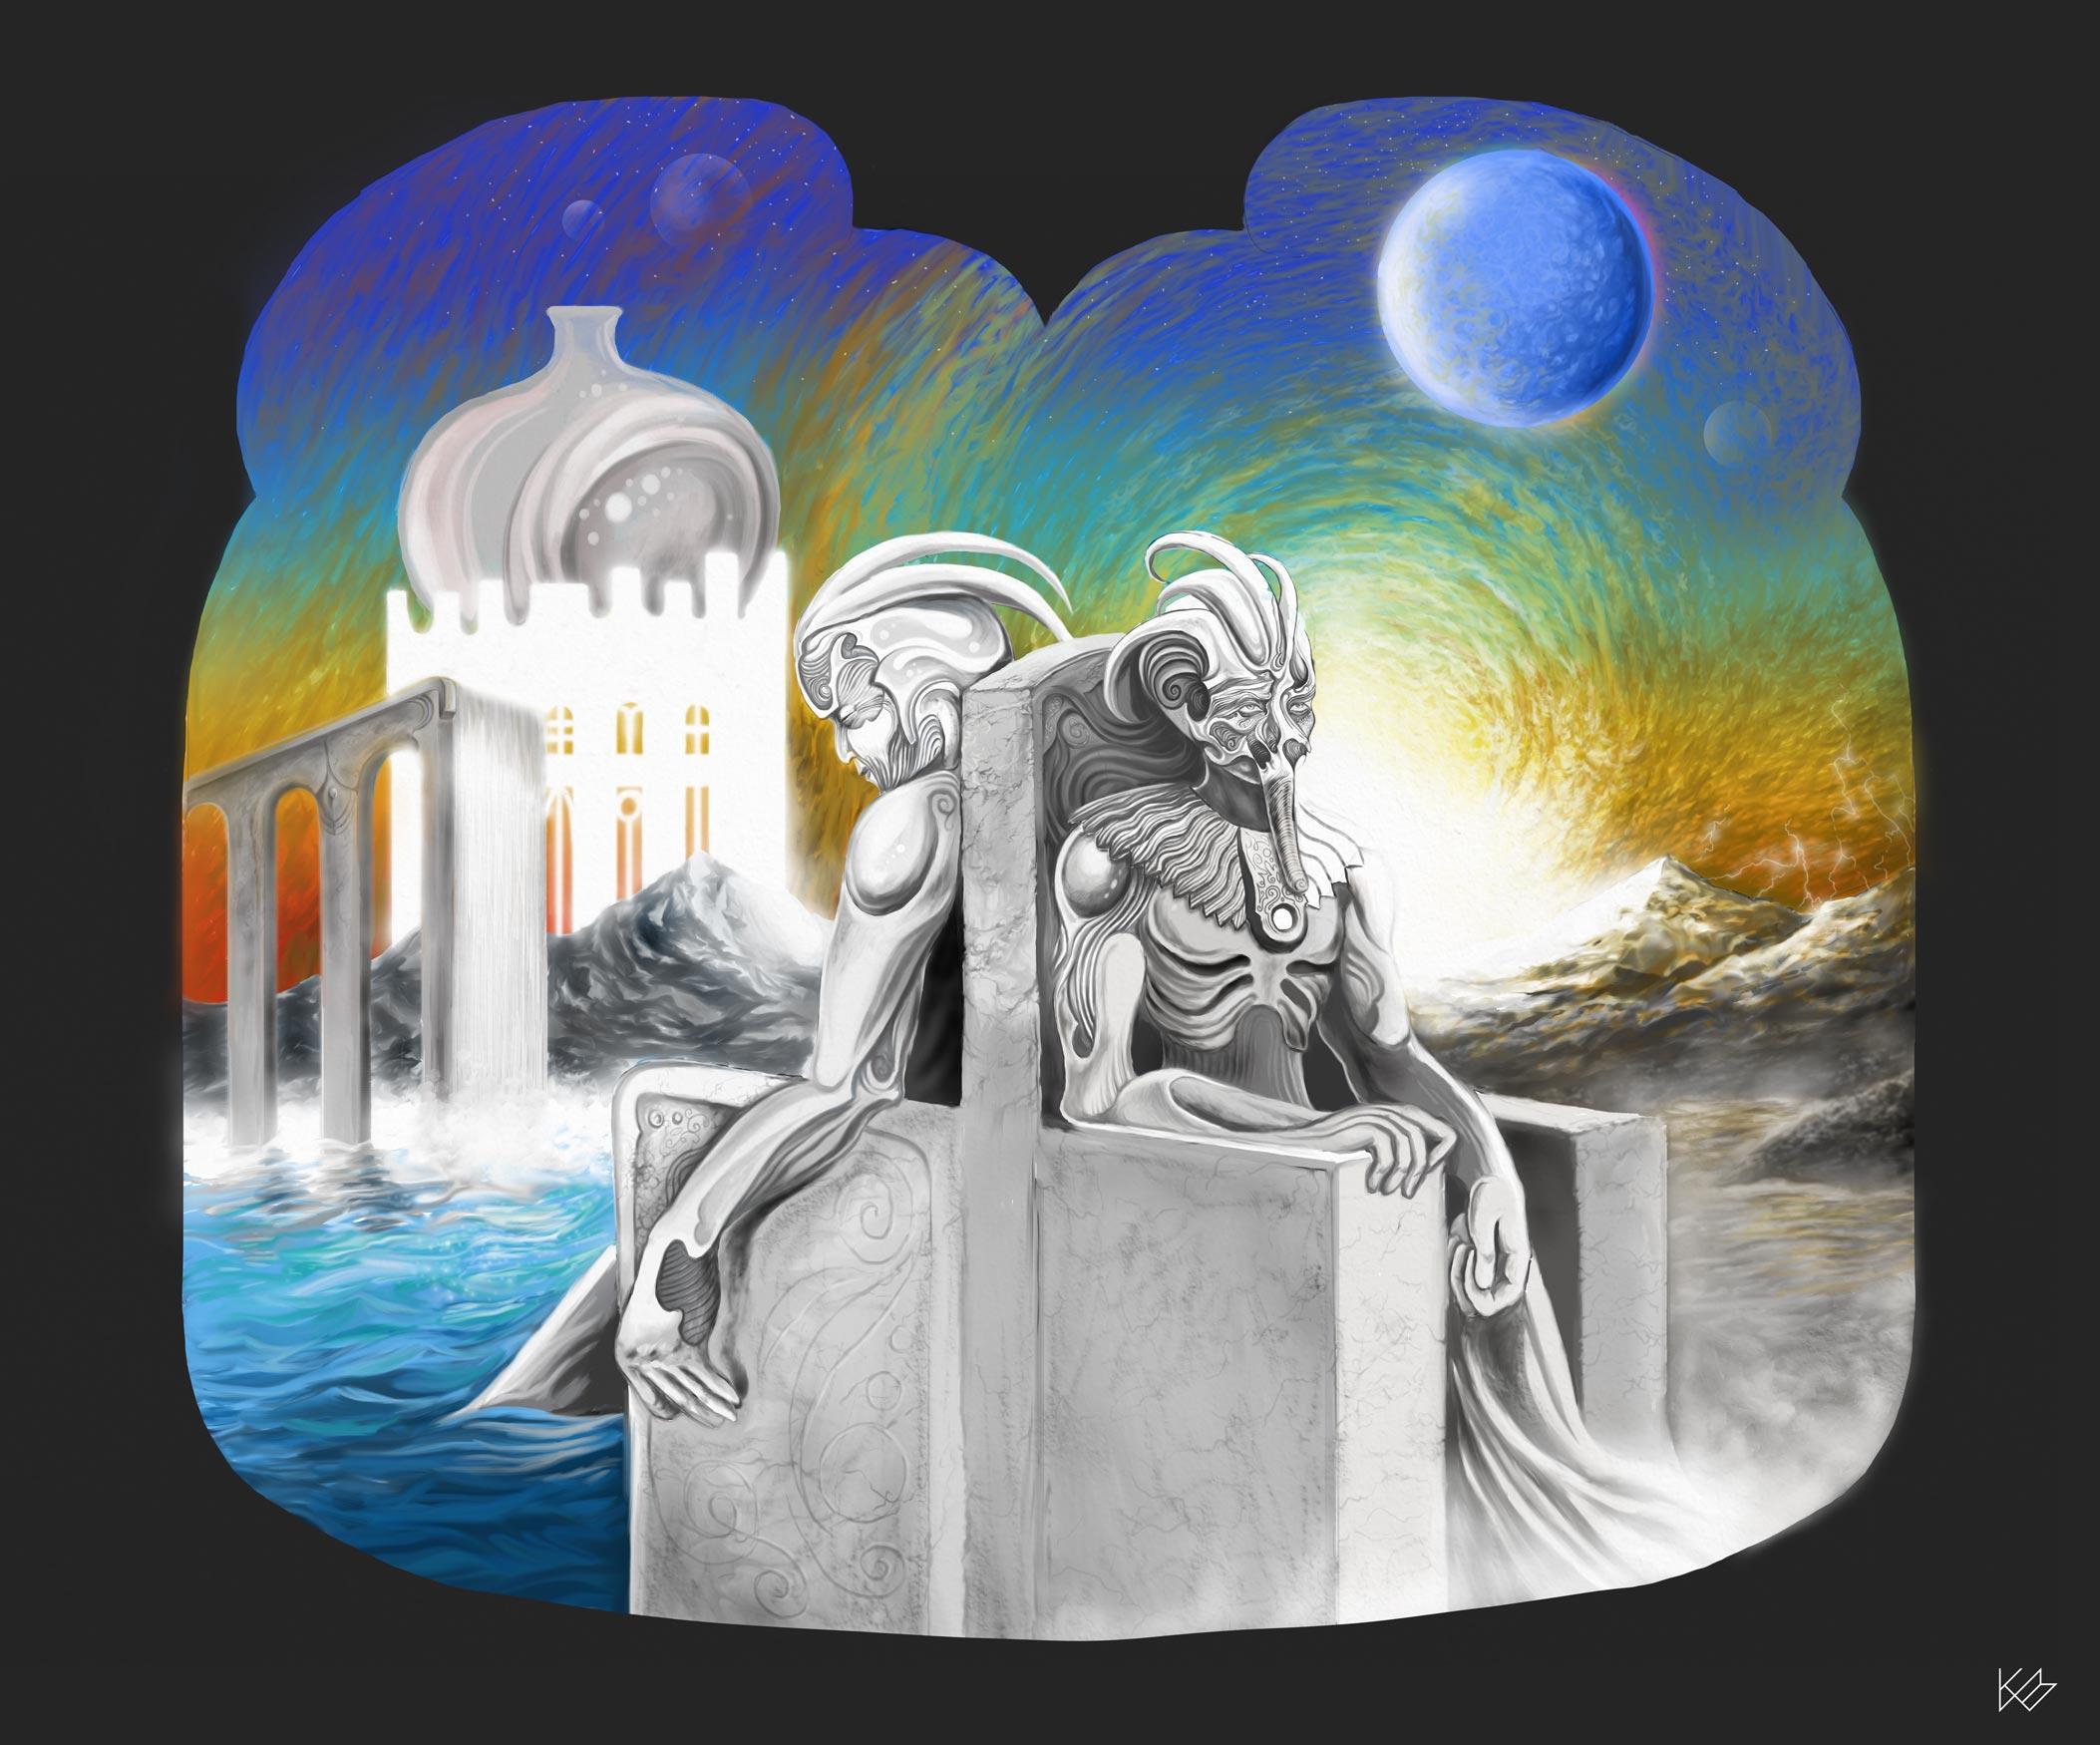 Somnia---by-Kieran-Stanislaw-Mace-v2-WEB